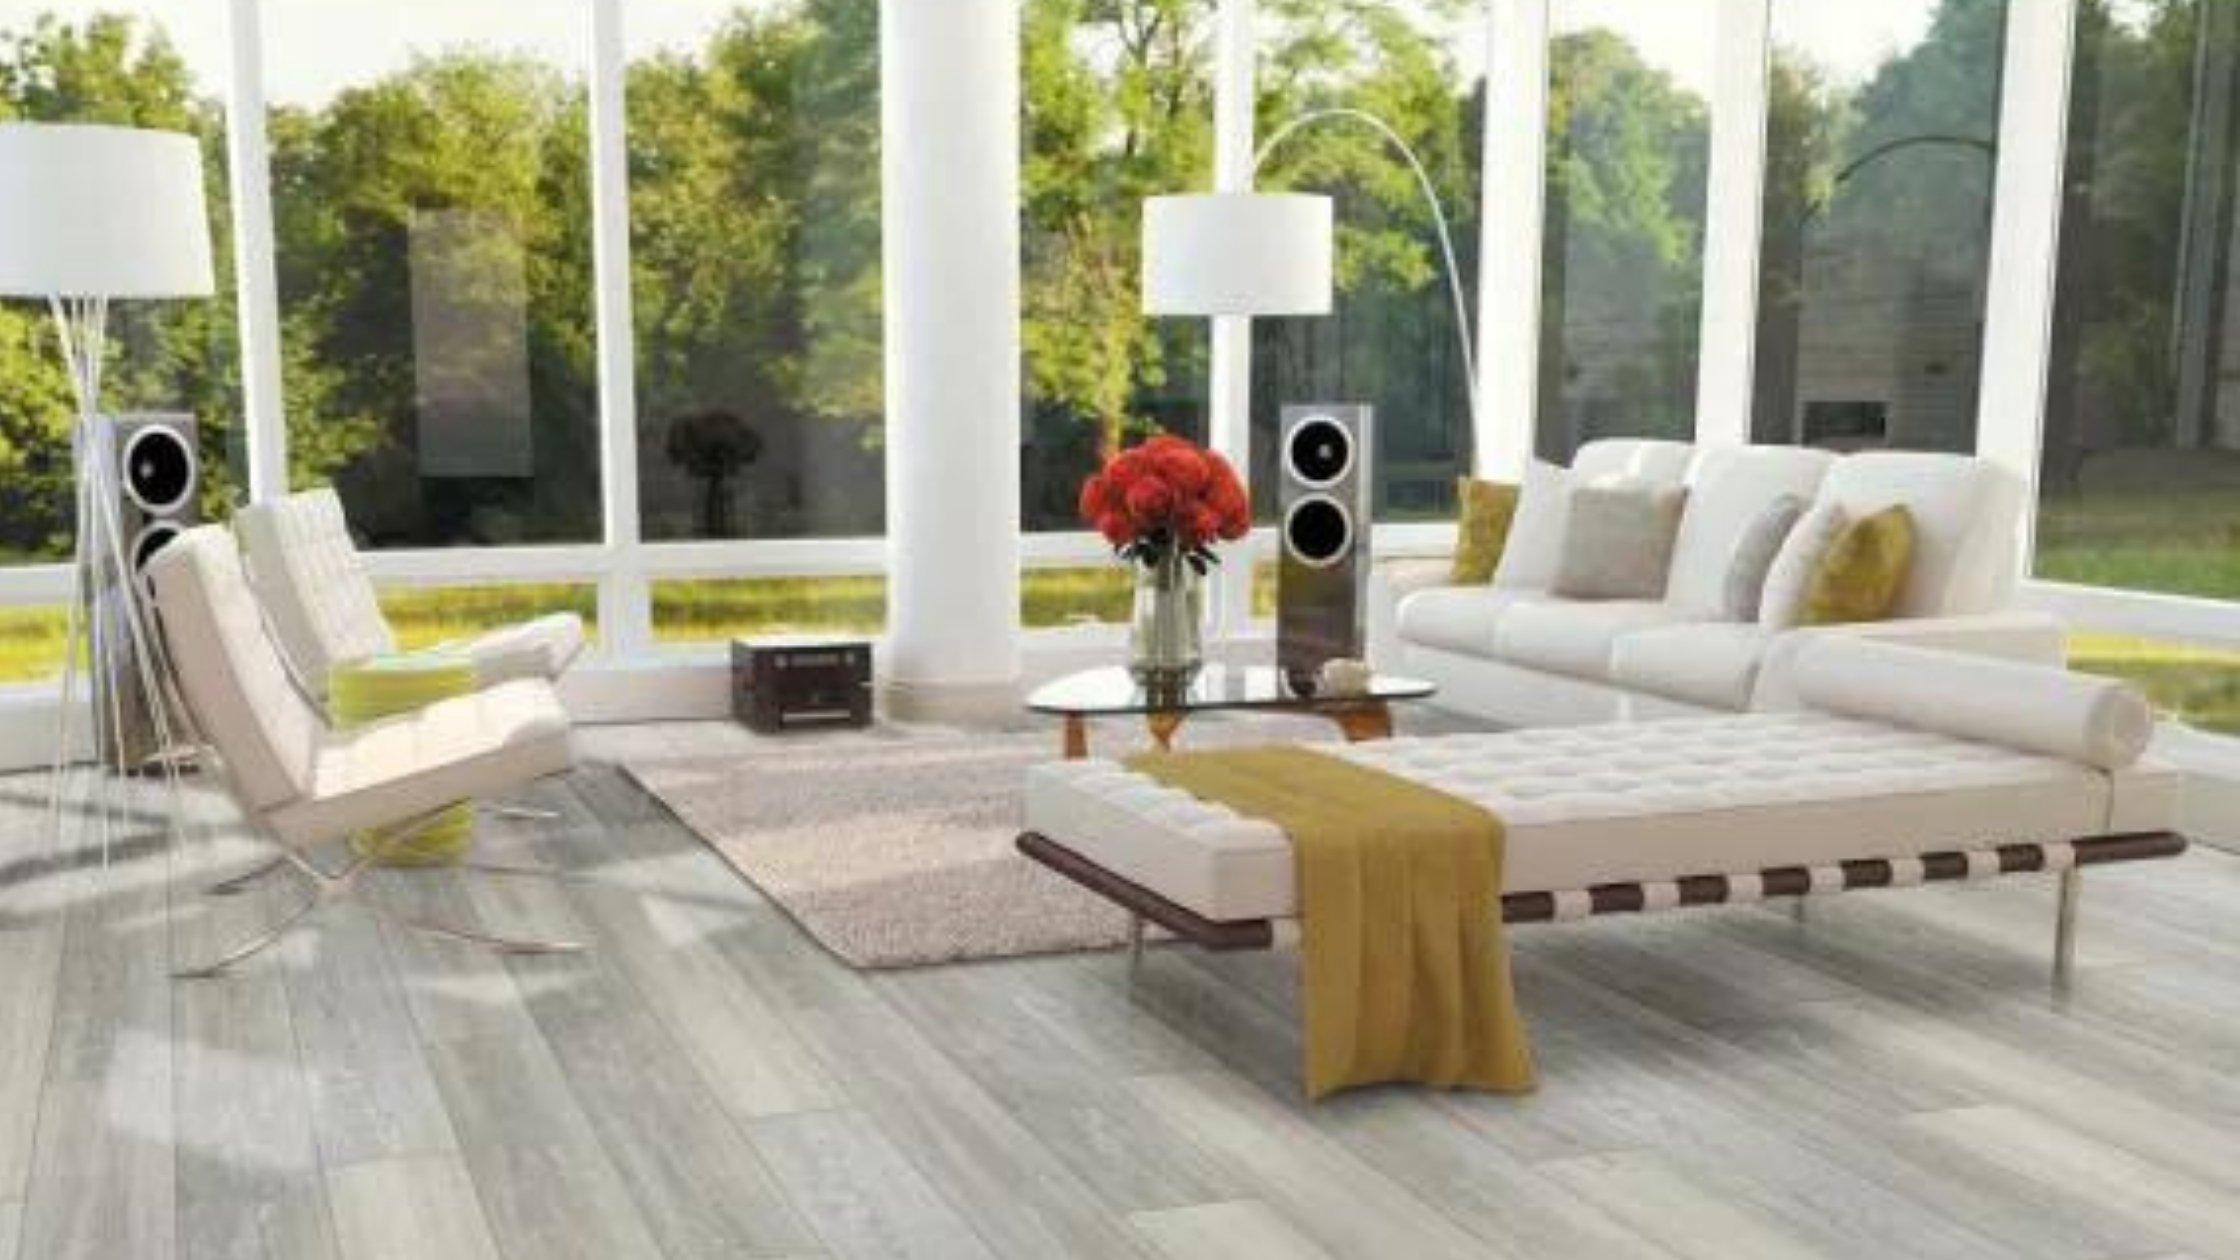 Vinyl Plank Flooring Review, Home Decorators Collection Laminate Flooring Reviews